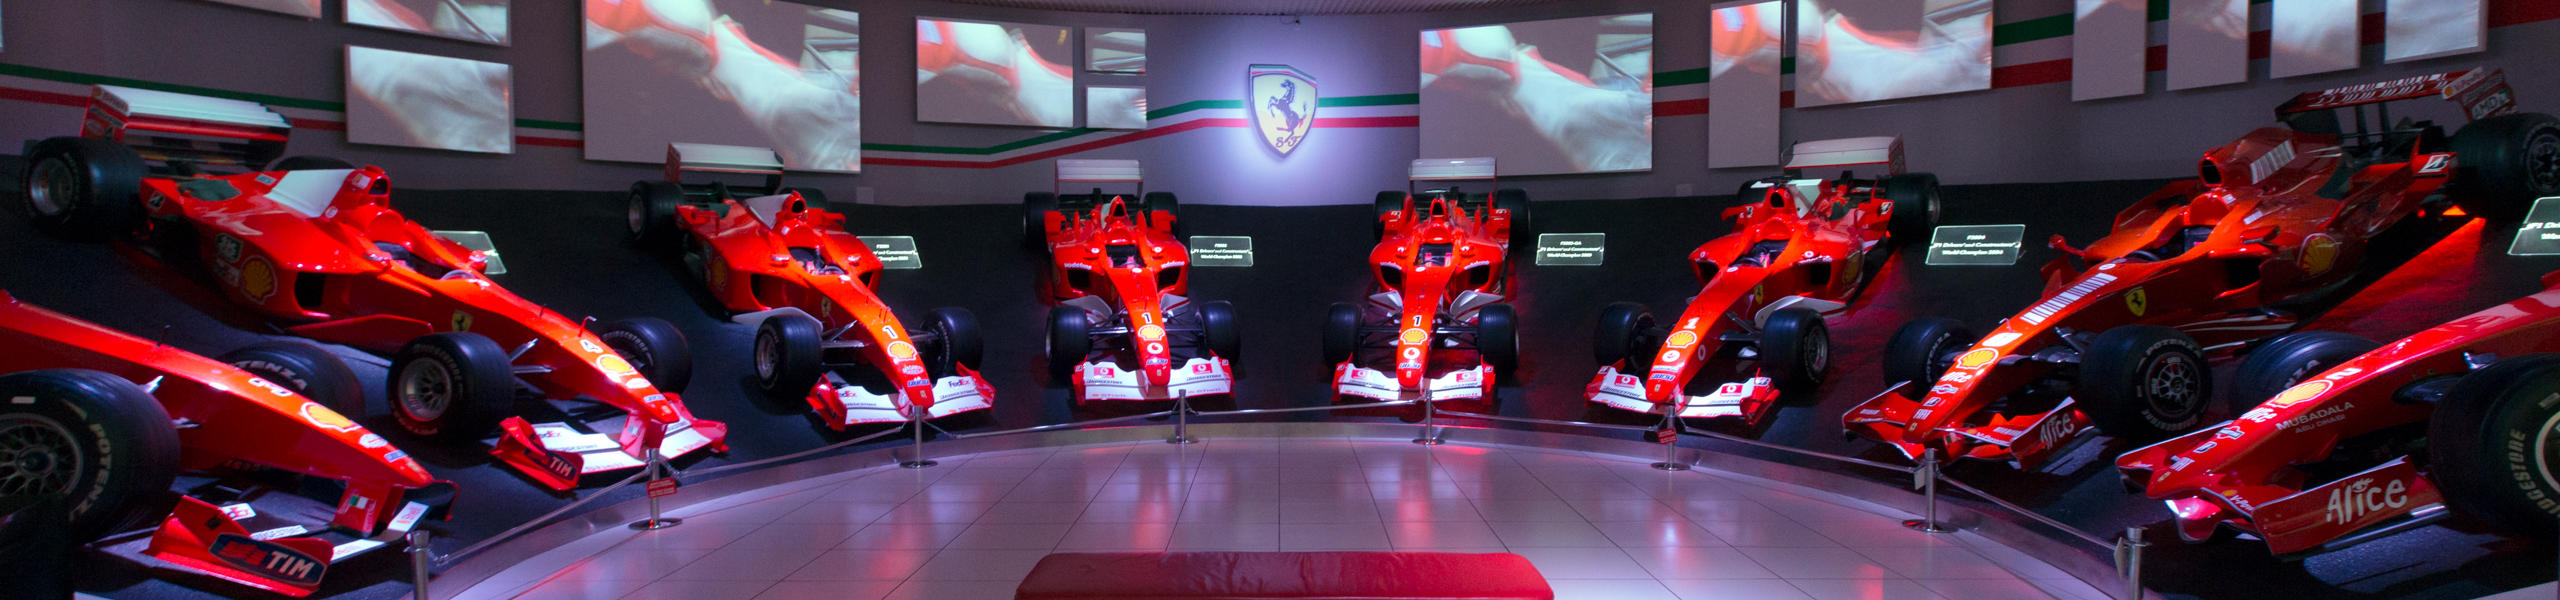 Tour Milano Maranello Con Ferrari A Noleggio Up Cars